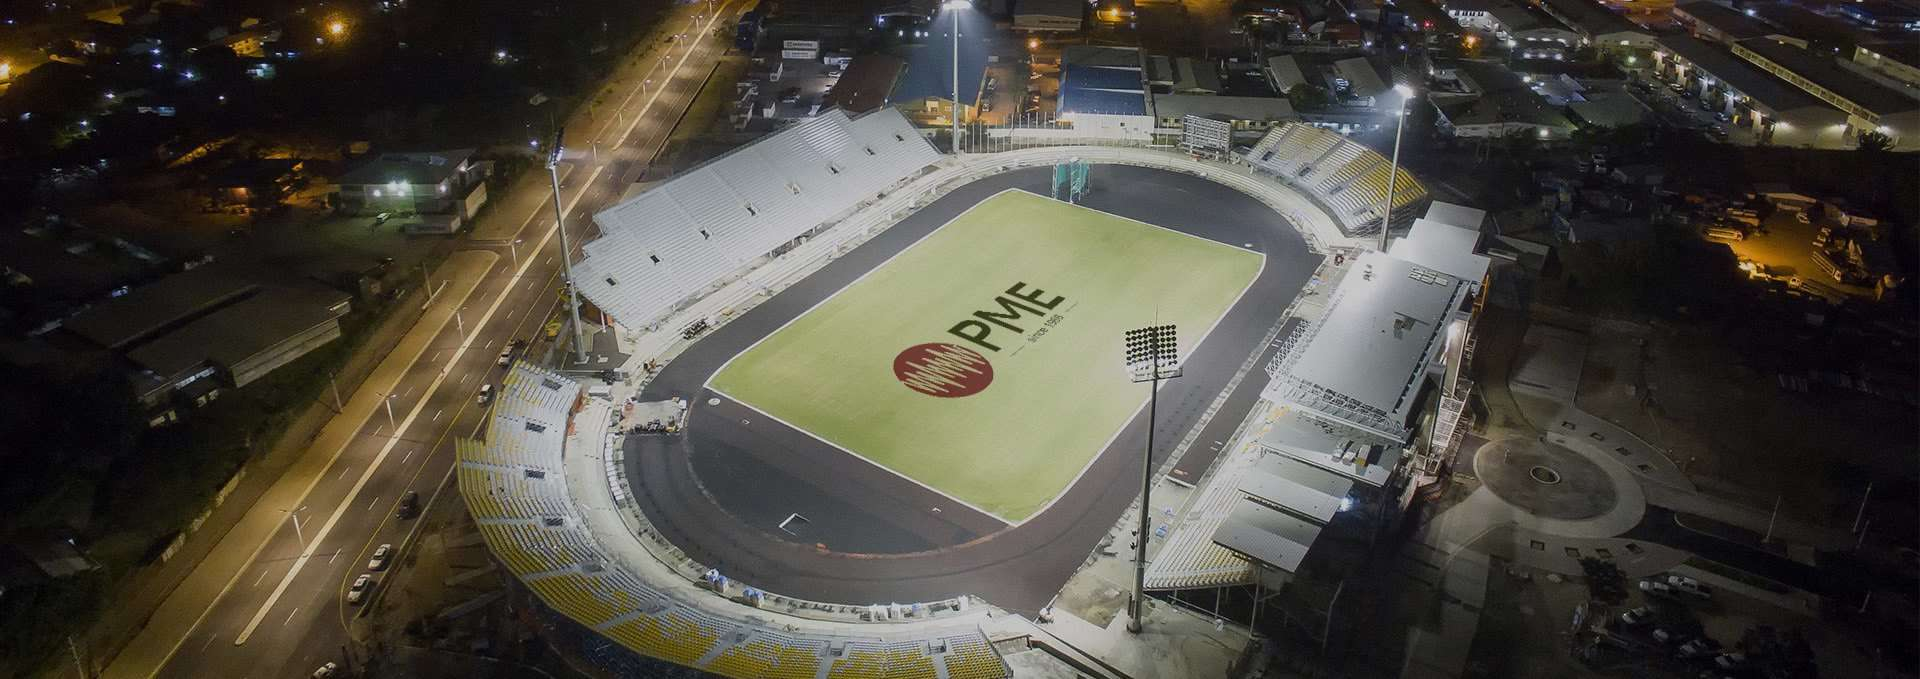 Stadium logo - Hazardous Area installations Port Moresby, PNG